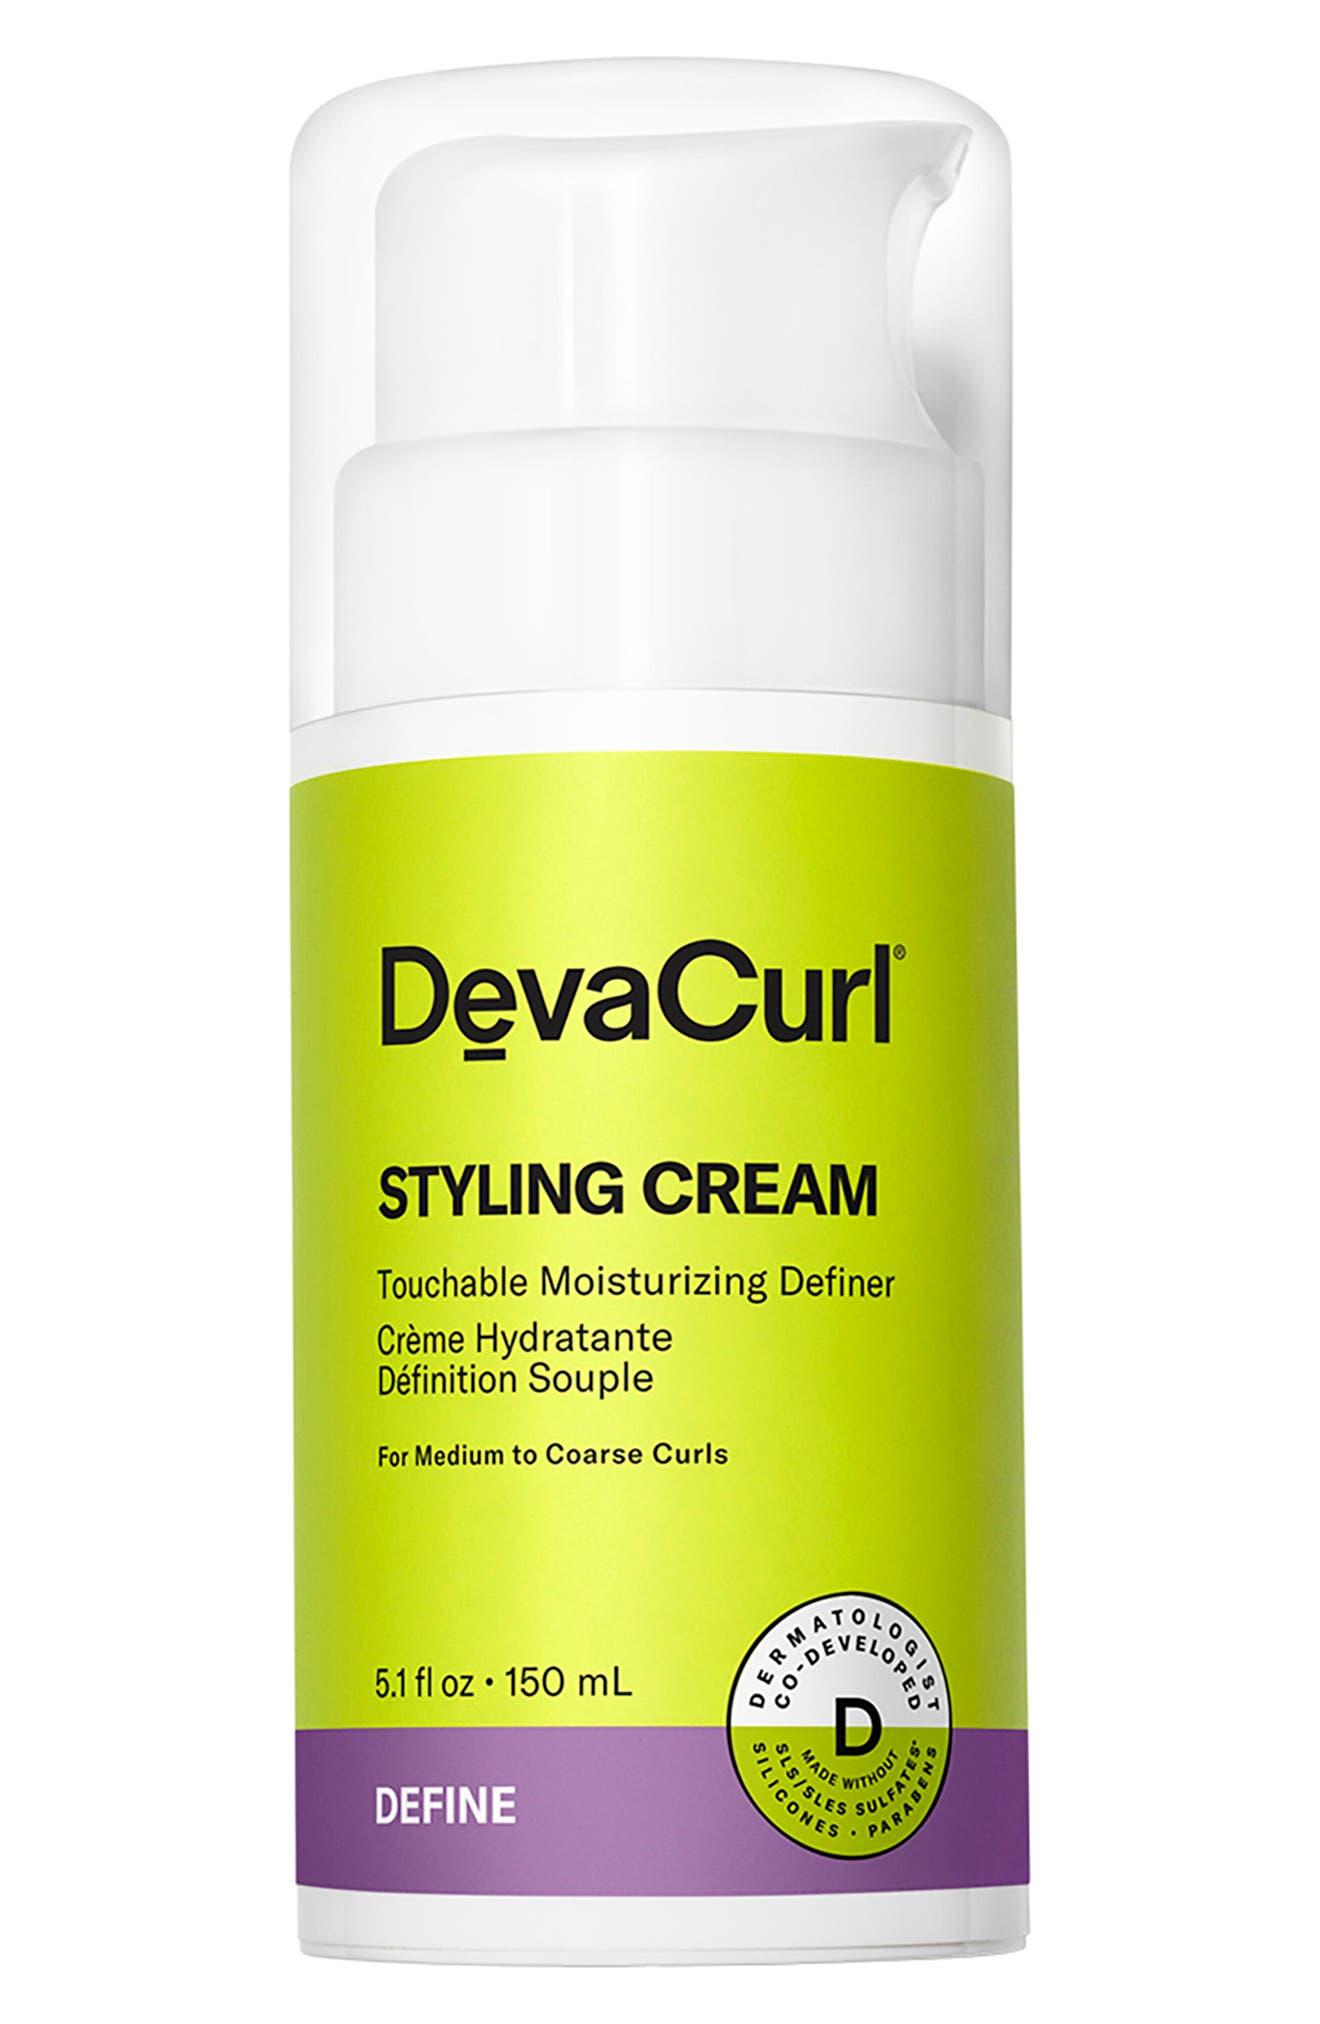 Styling Cream Touchable Moisturizing Definer